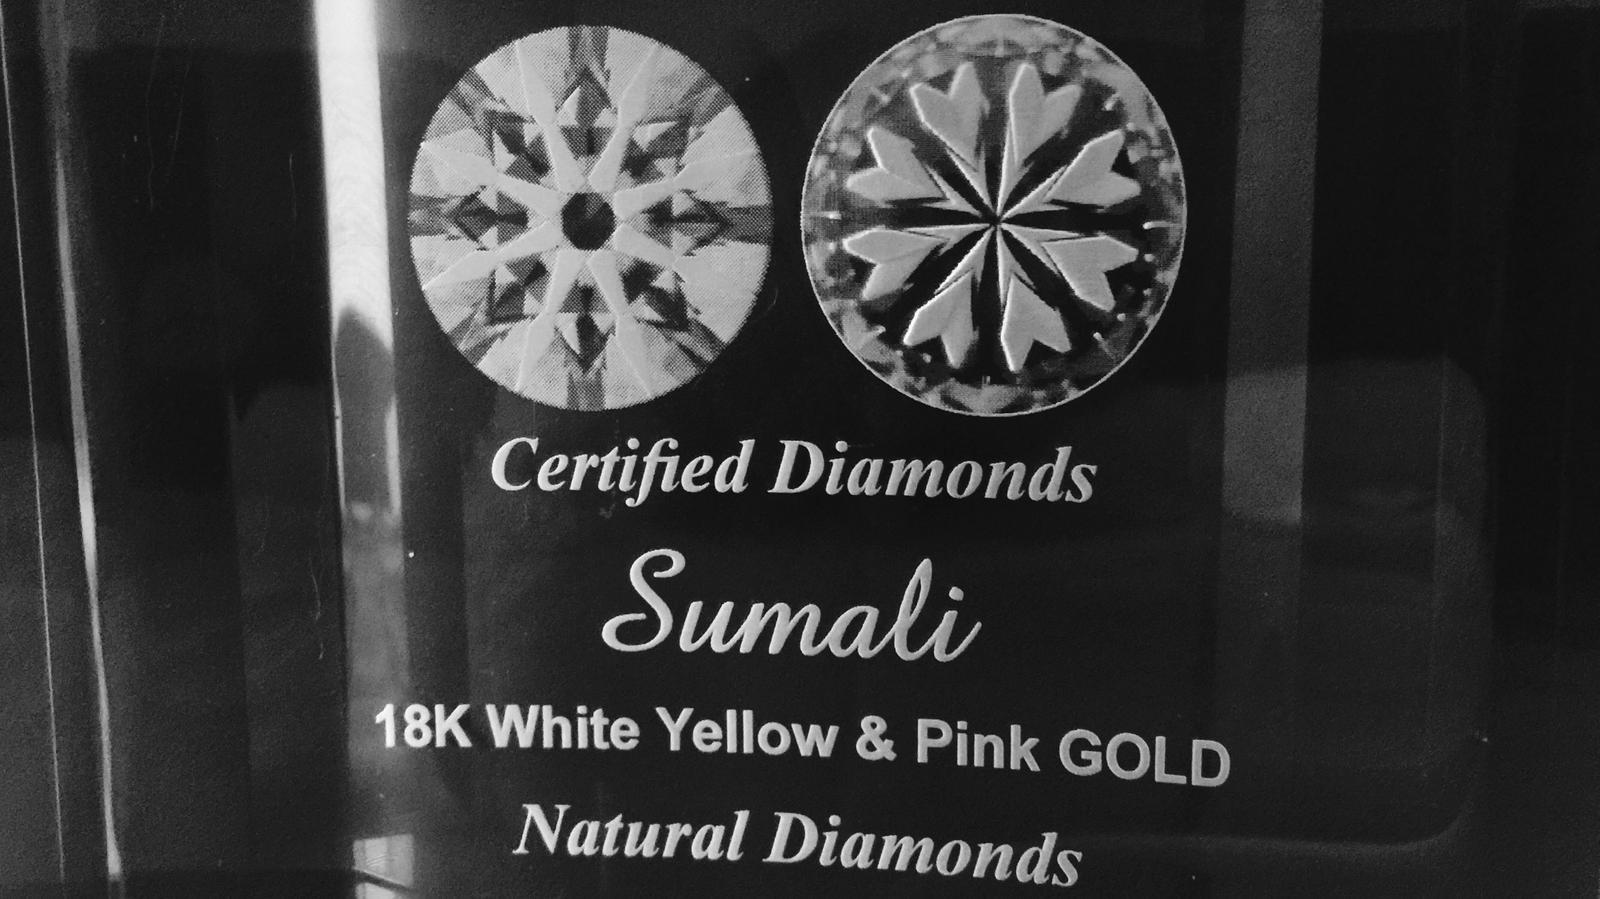 Sumali Collections